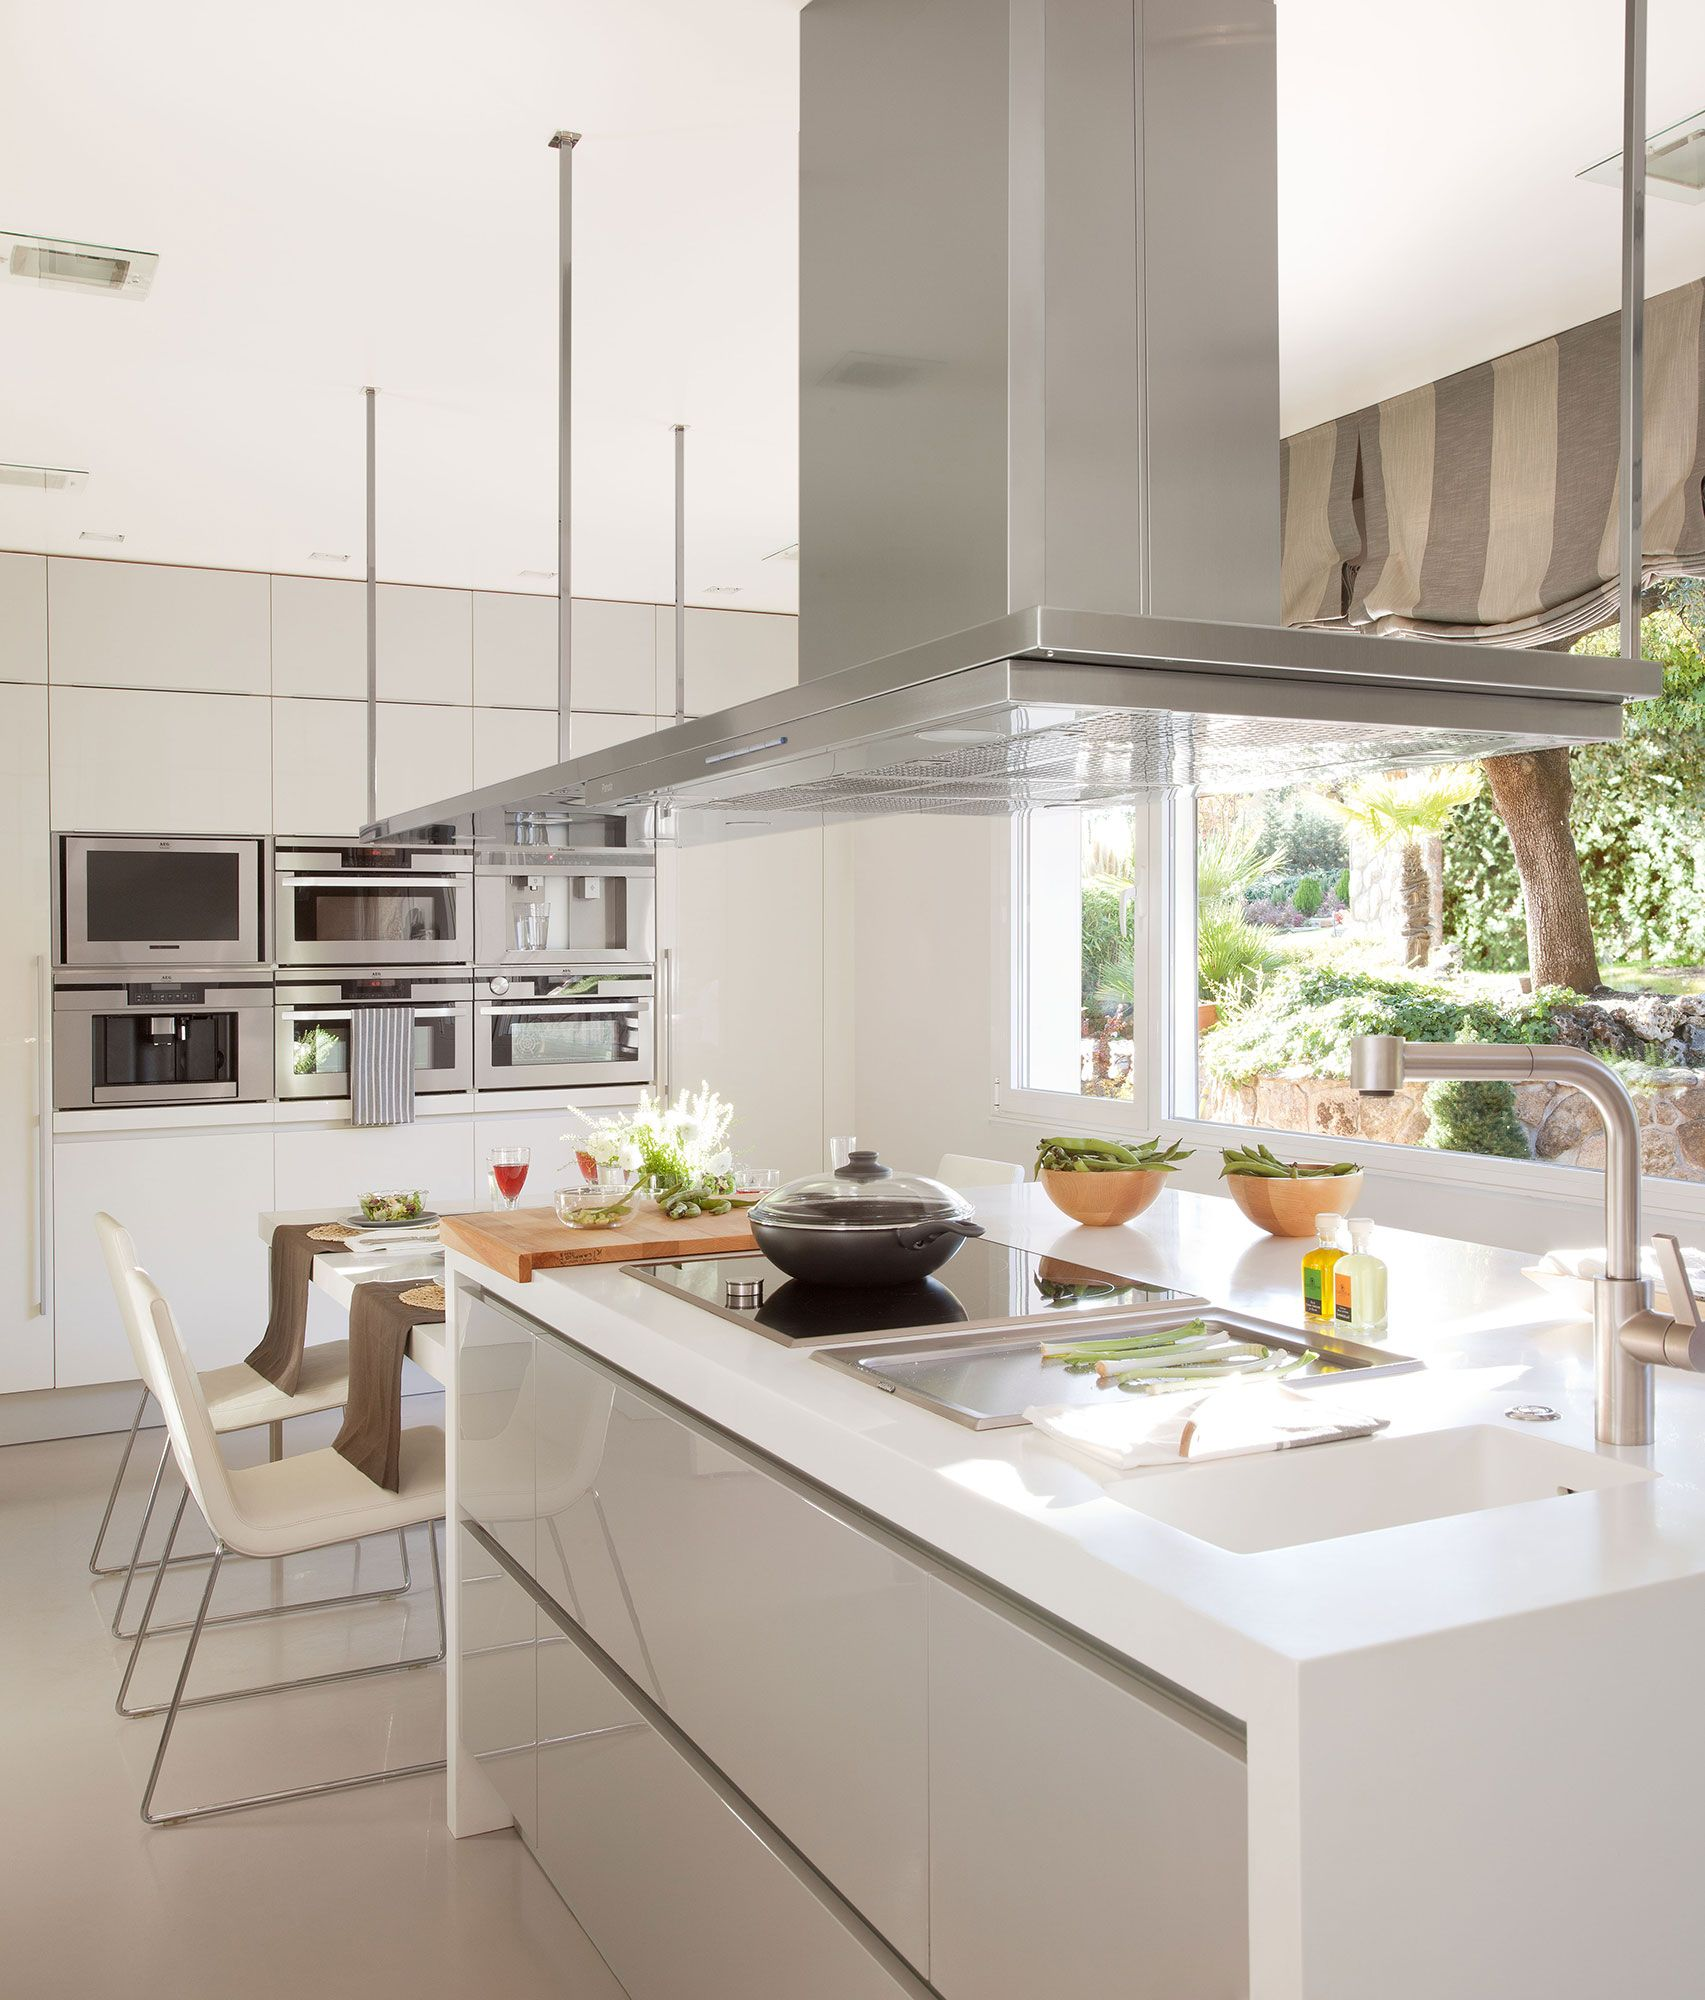 Cocina De Dise O Moderno Con Isla En Blanco Y Gris